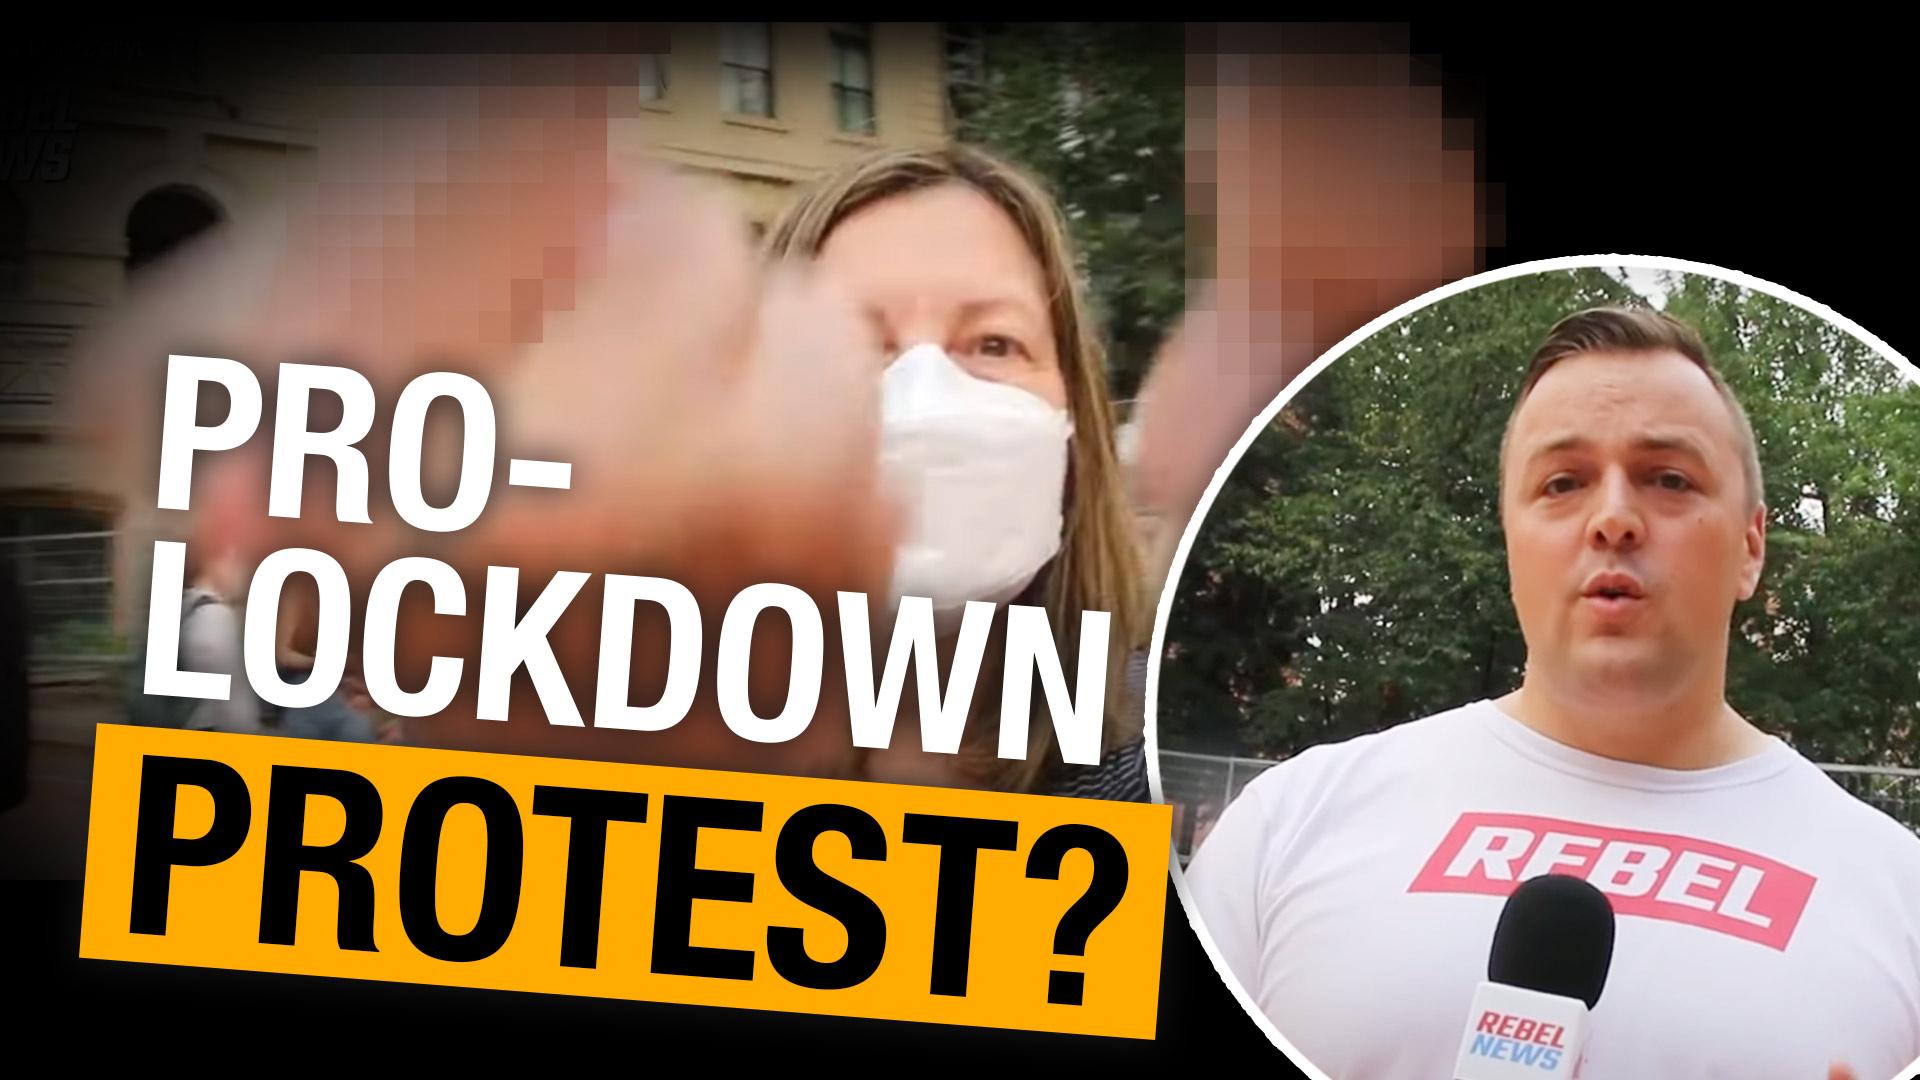 Pro-lockdown protesters demand Alberta brings back public health restrictions